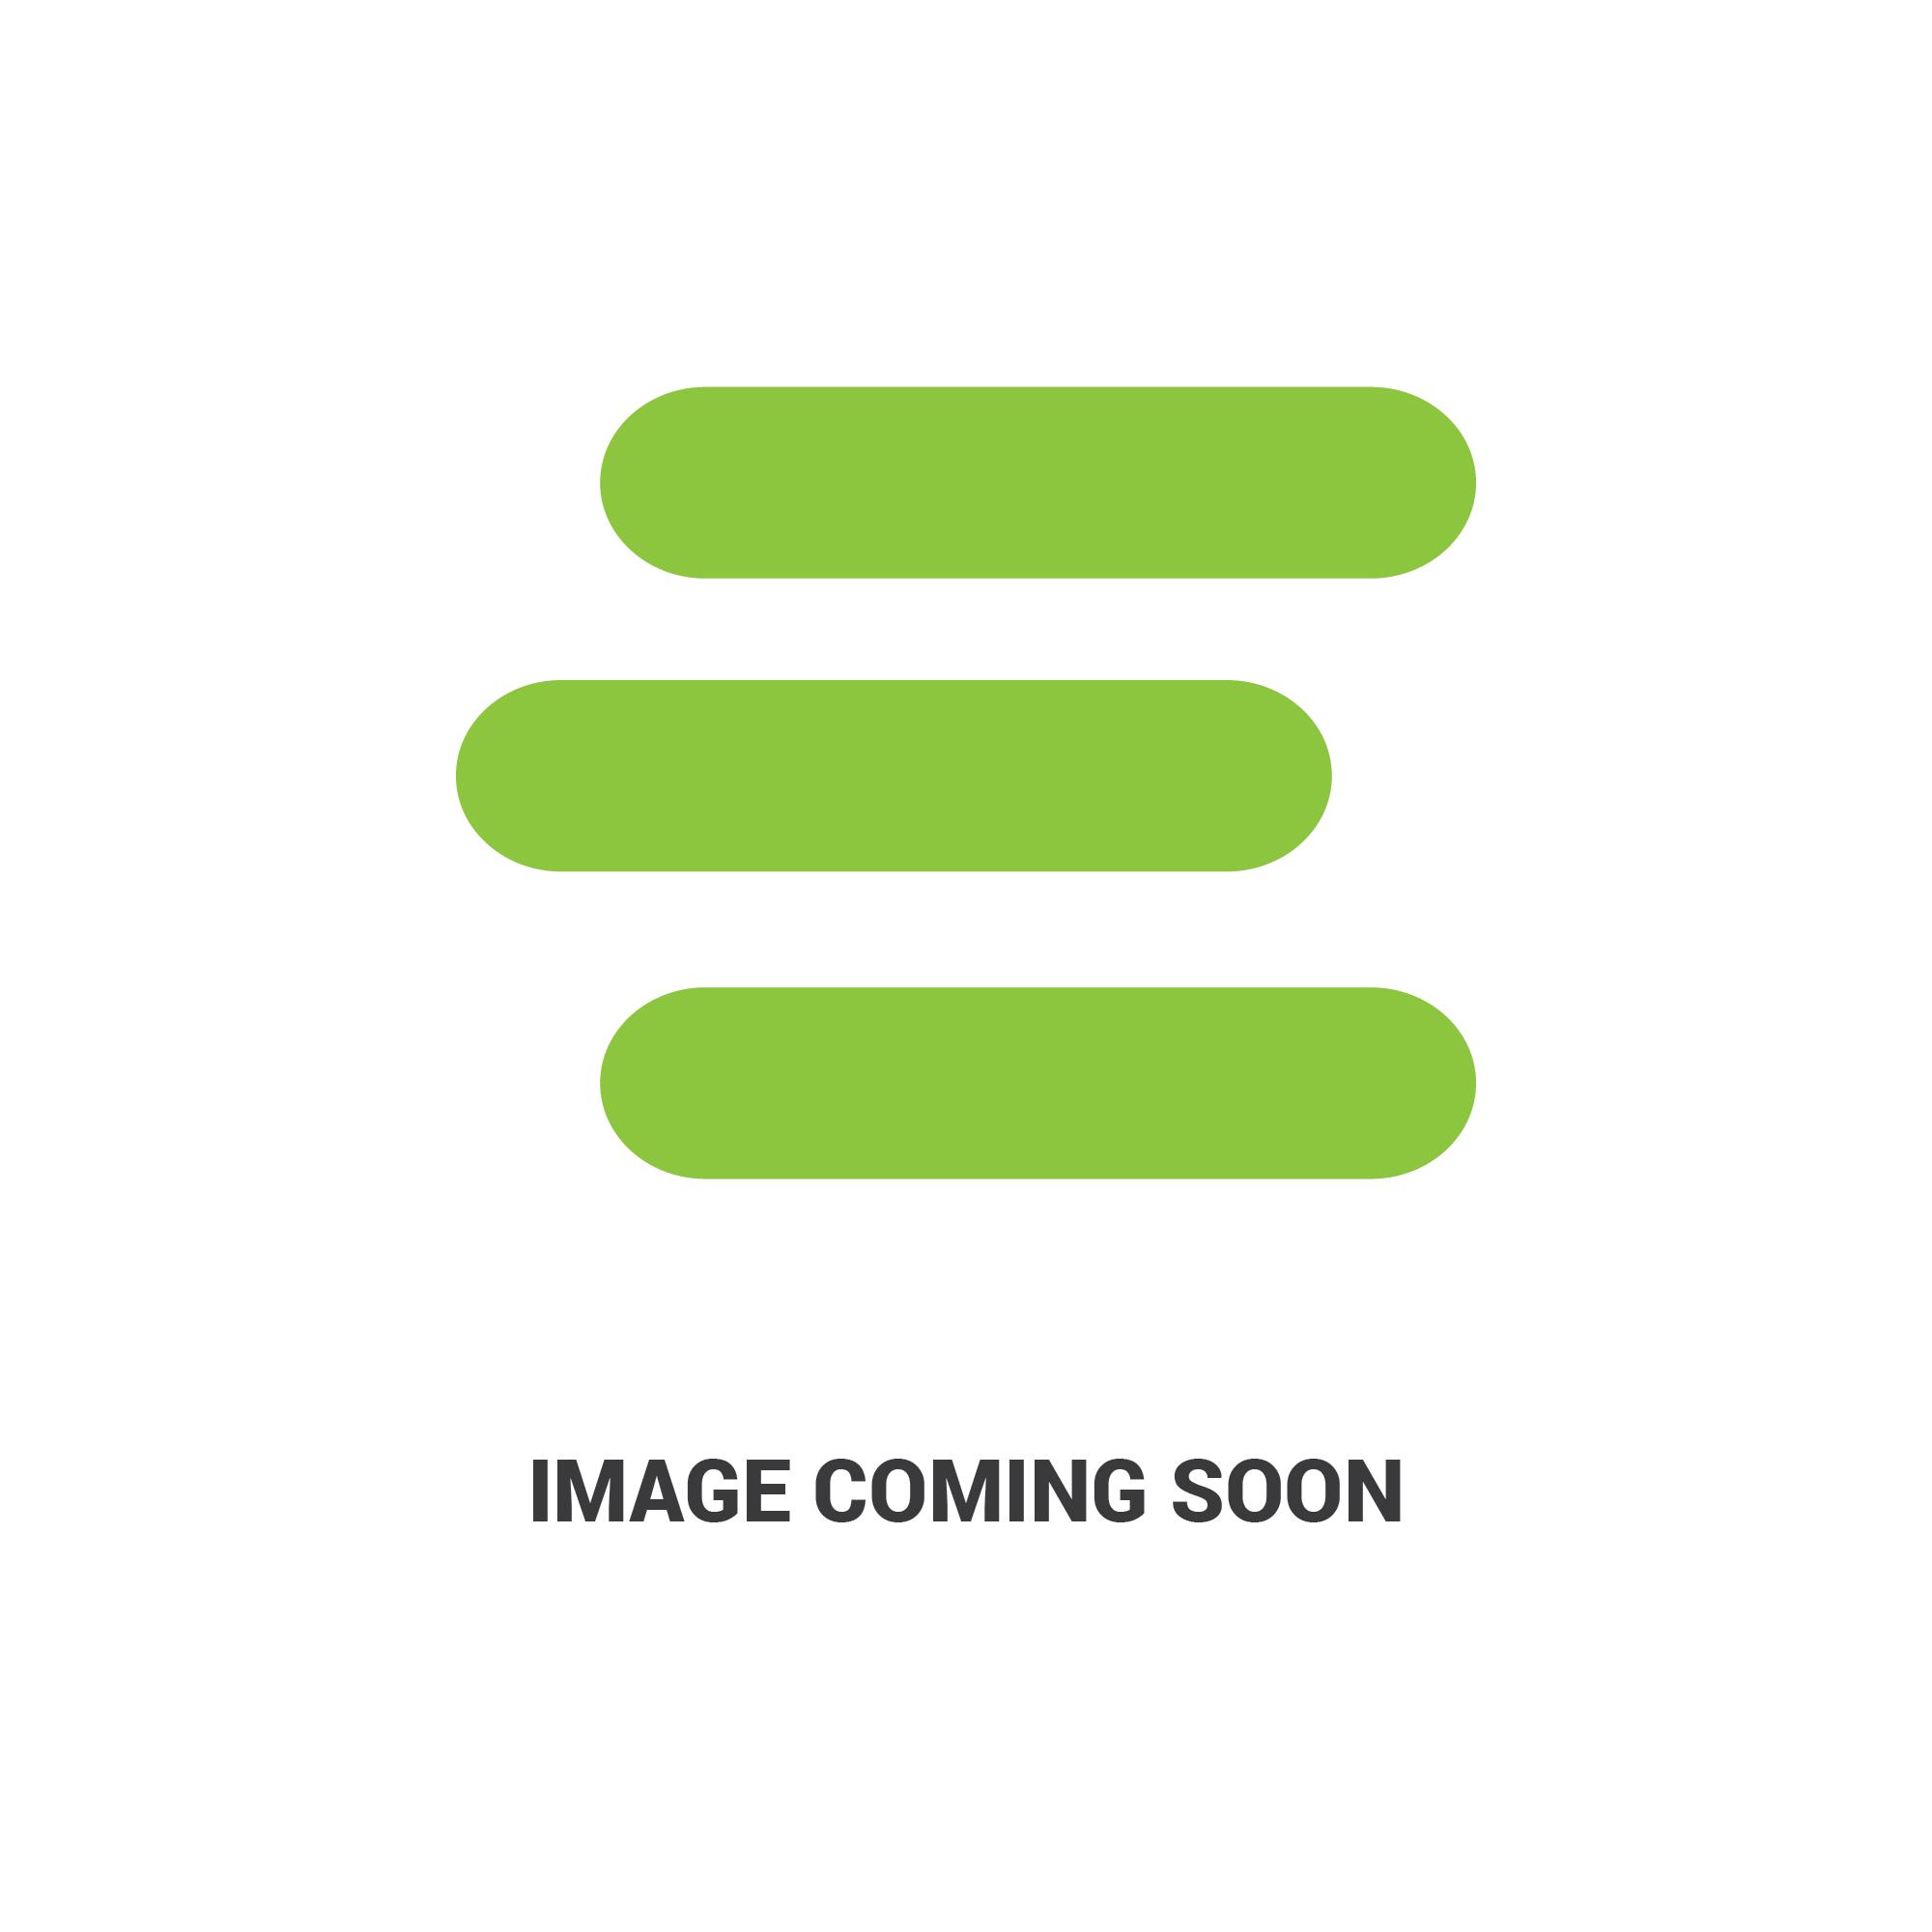 E-6625298edit 2.jpg